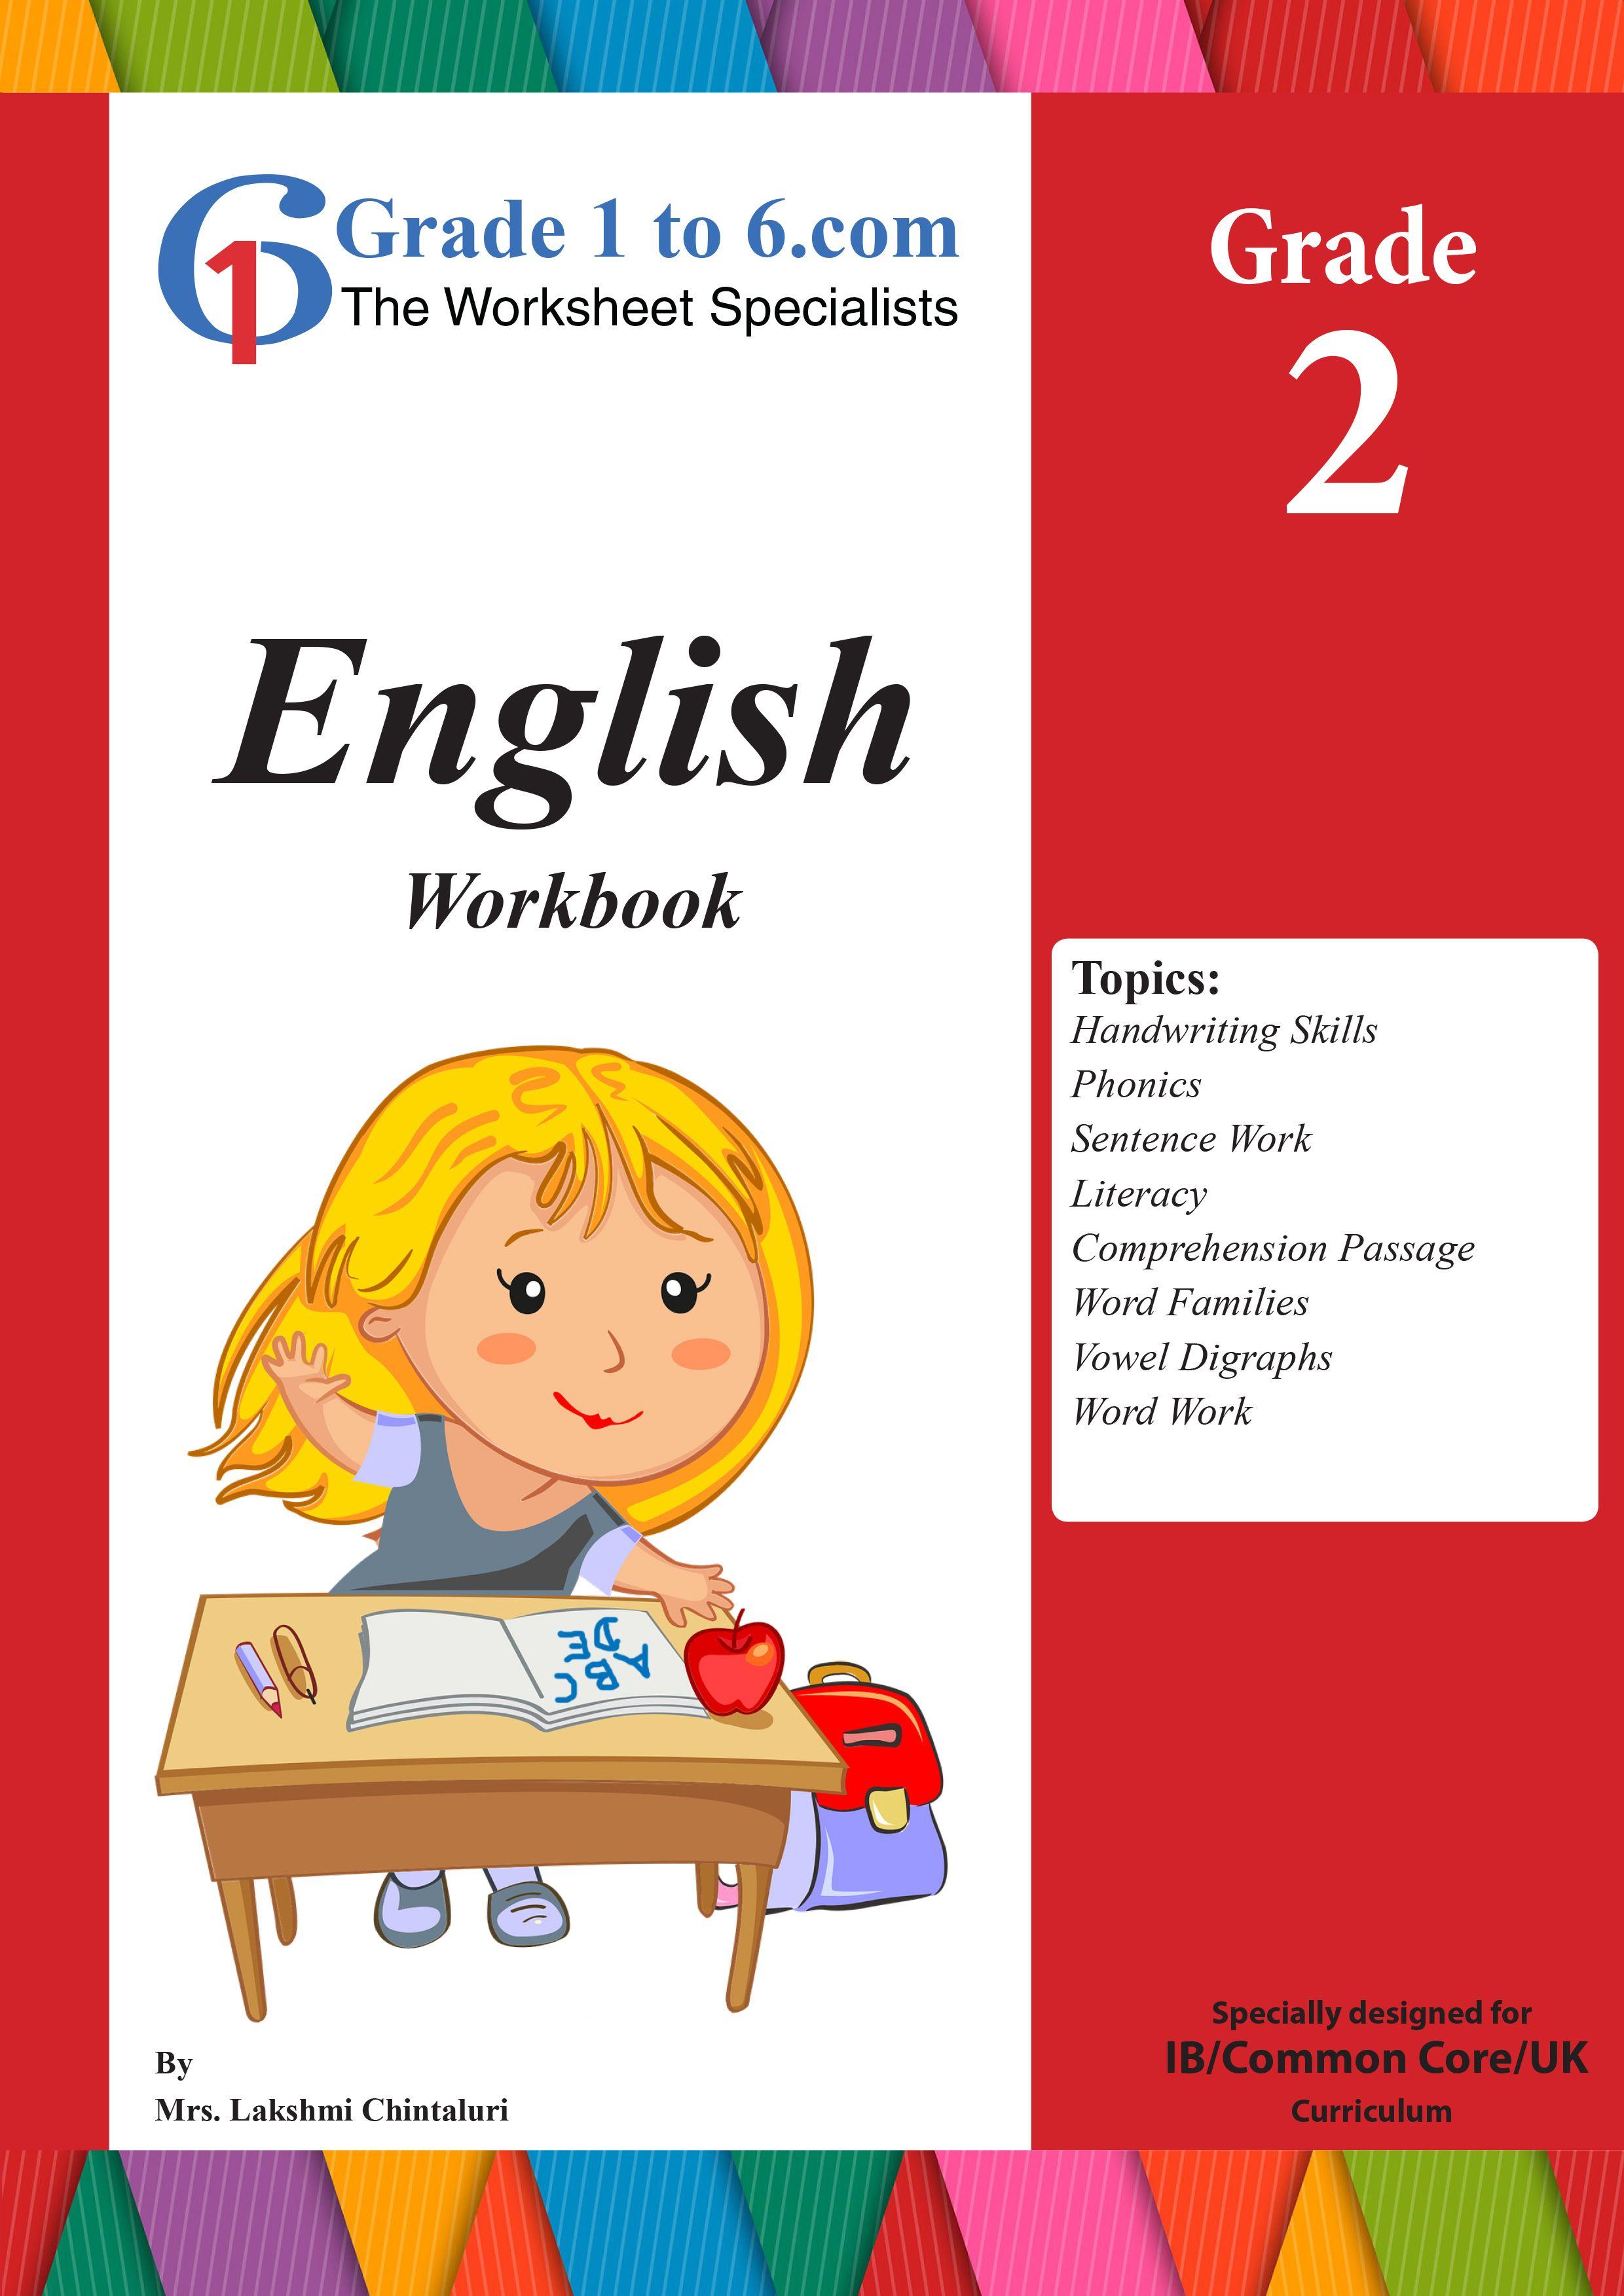 Grade 2 English Workbook Worksheets Bundle From